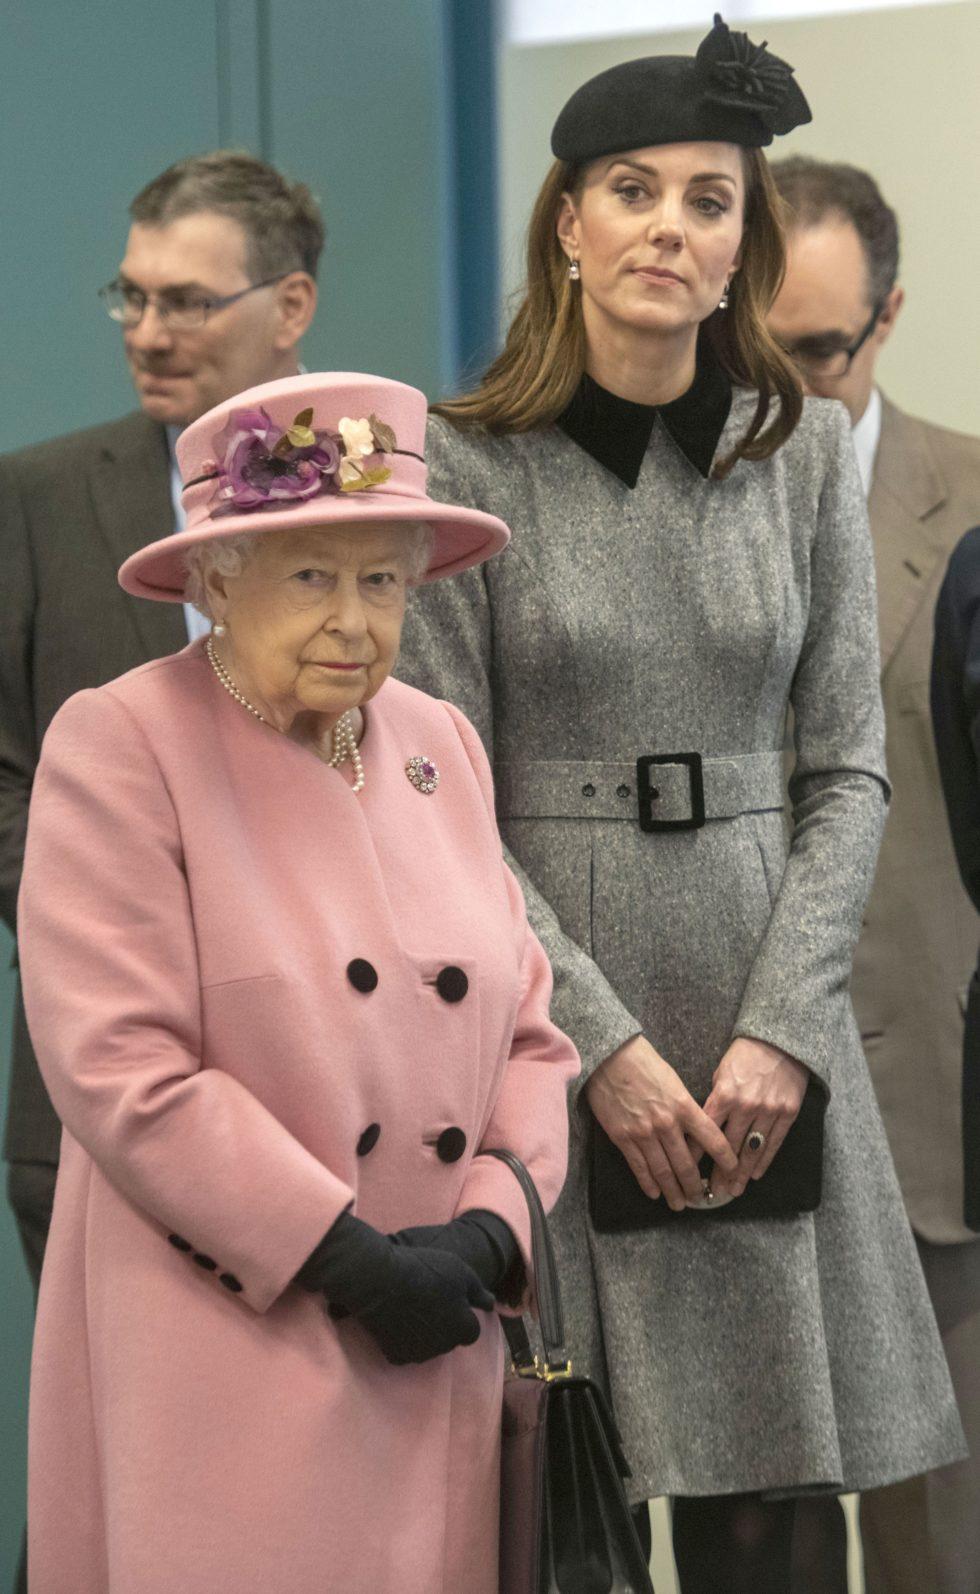 Ce distincție importantă a primit Kate Middleton